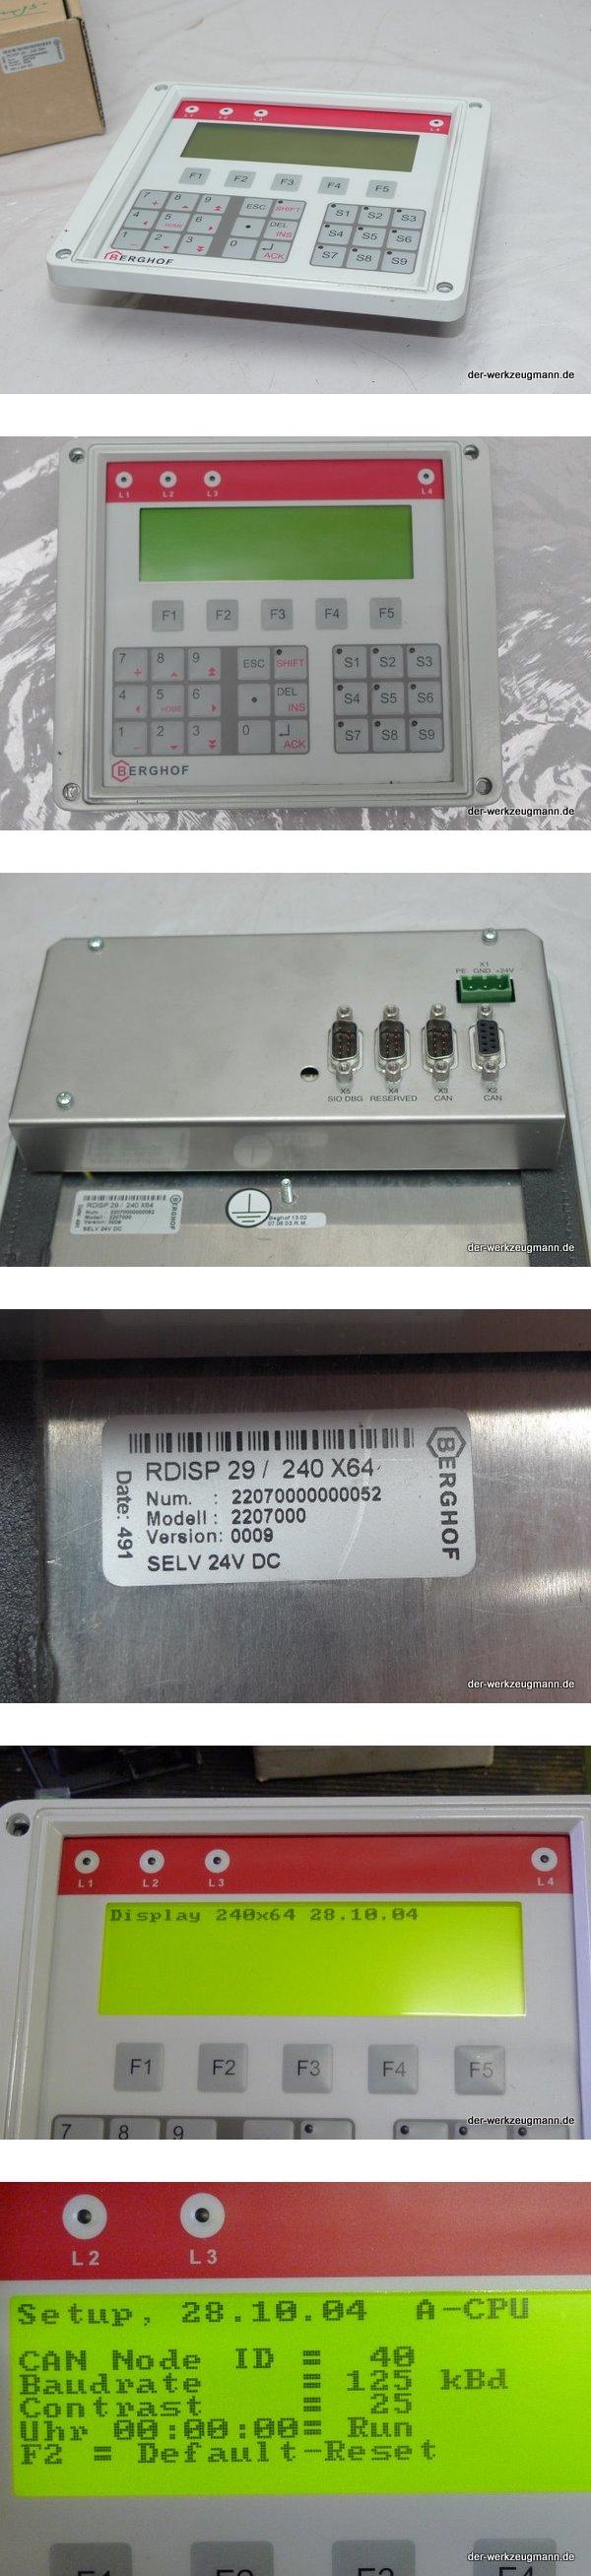 Berghof Display Panel RDISP 29 / 240 X64 24V DC 2207000